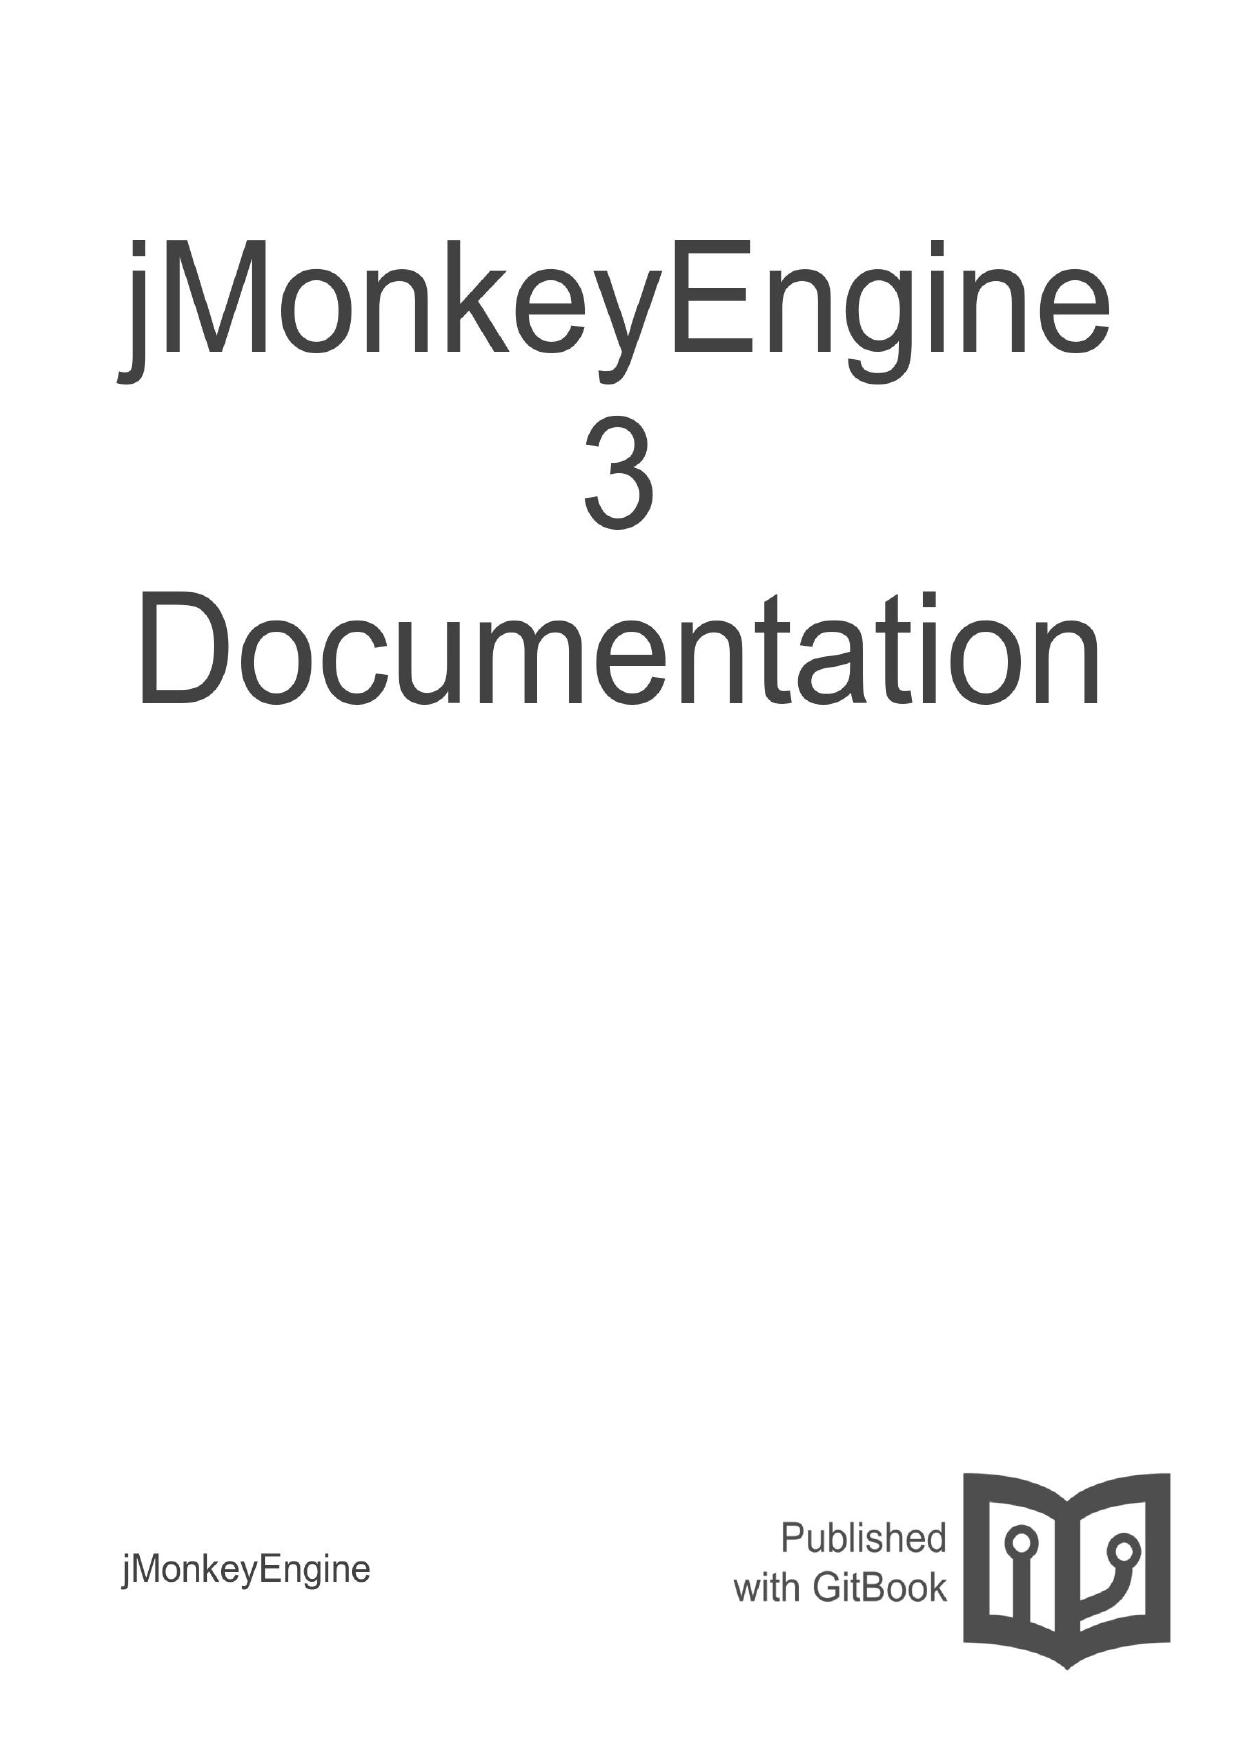 pikatoimitus 50% hinta lenkkarit halpaa jMonkeyEngine 3 Documentation | manualzz.com